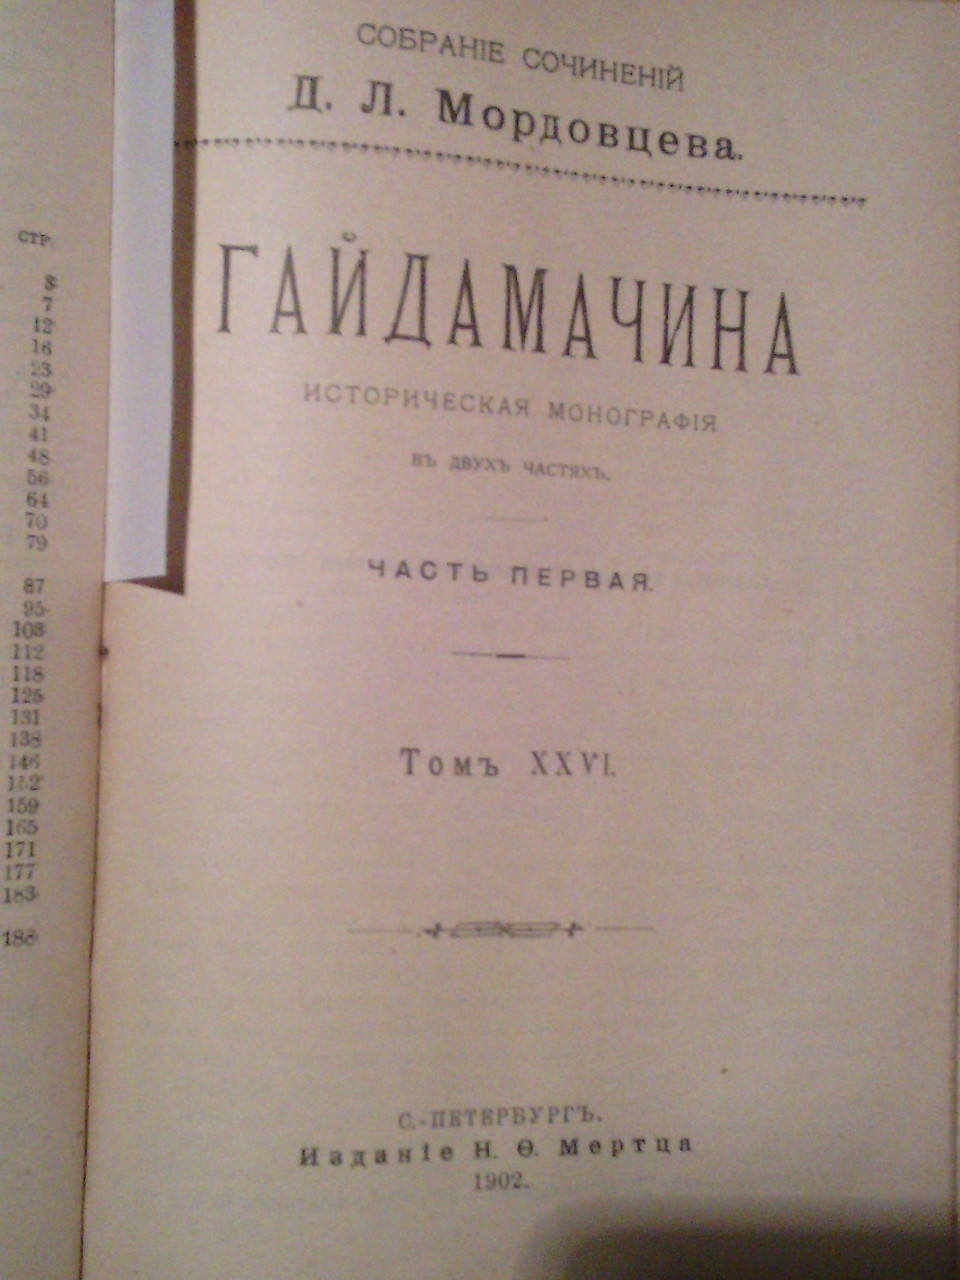 Книга Гайдамаччина.Д.Мордовцев, 1902 год. прижизн. издание